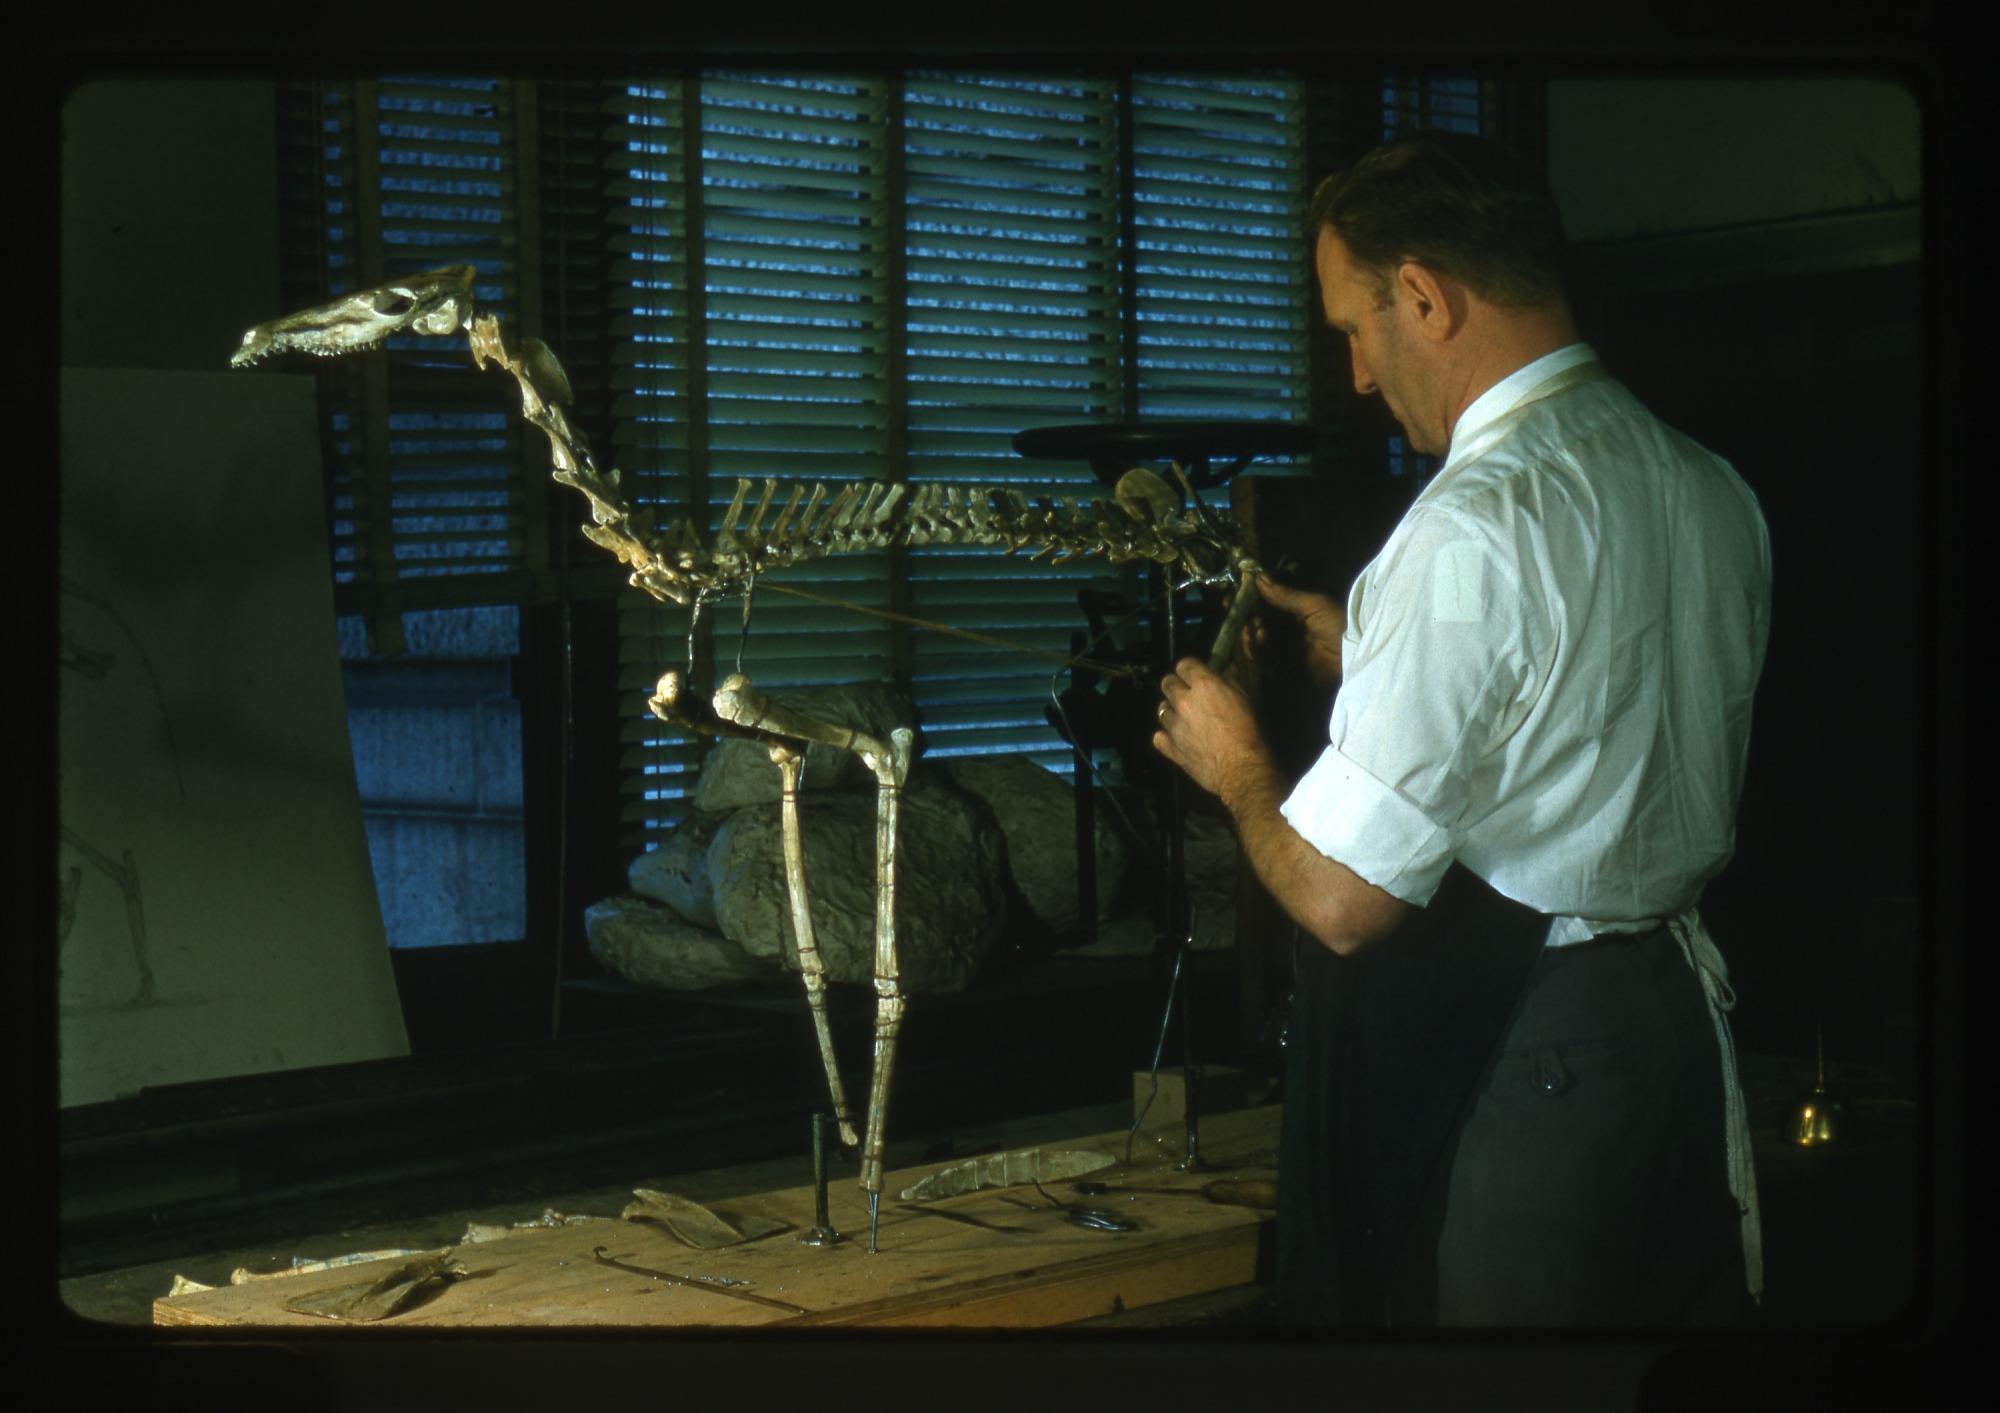 Nick Hotton Working on a Skeleton